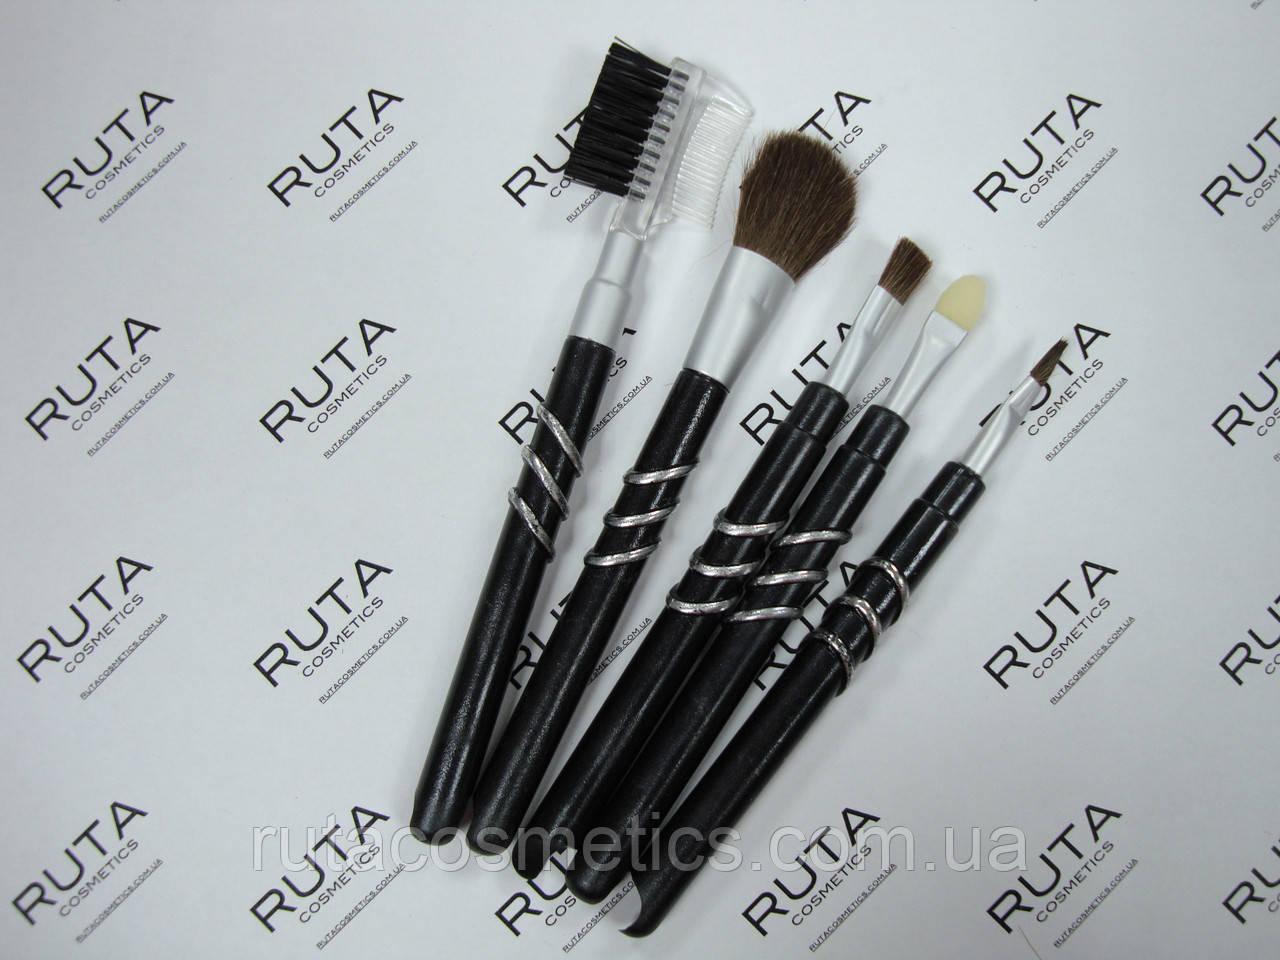 Набор кистей для макияжа (5 предметов)